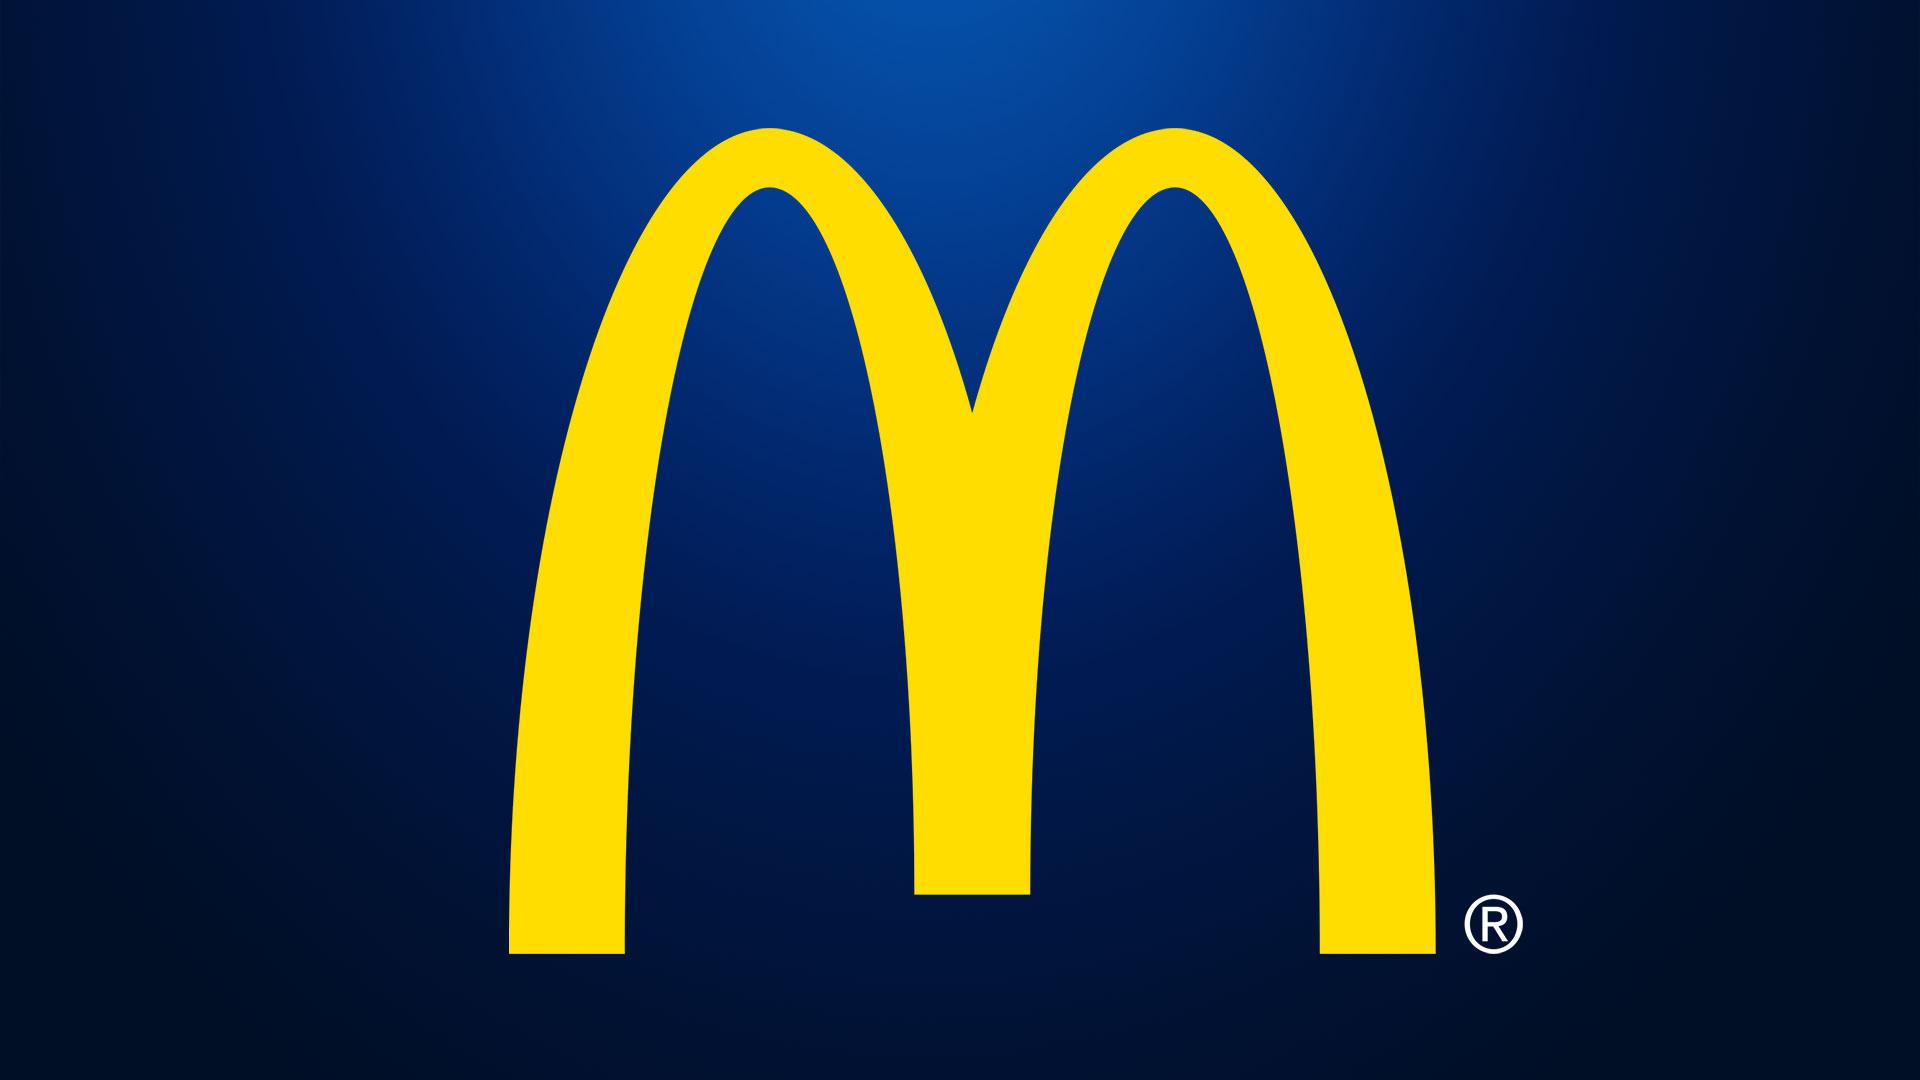 KELO McDonalds